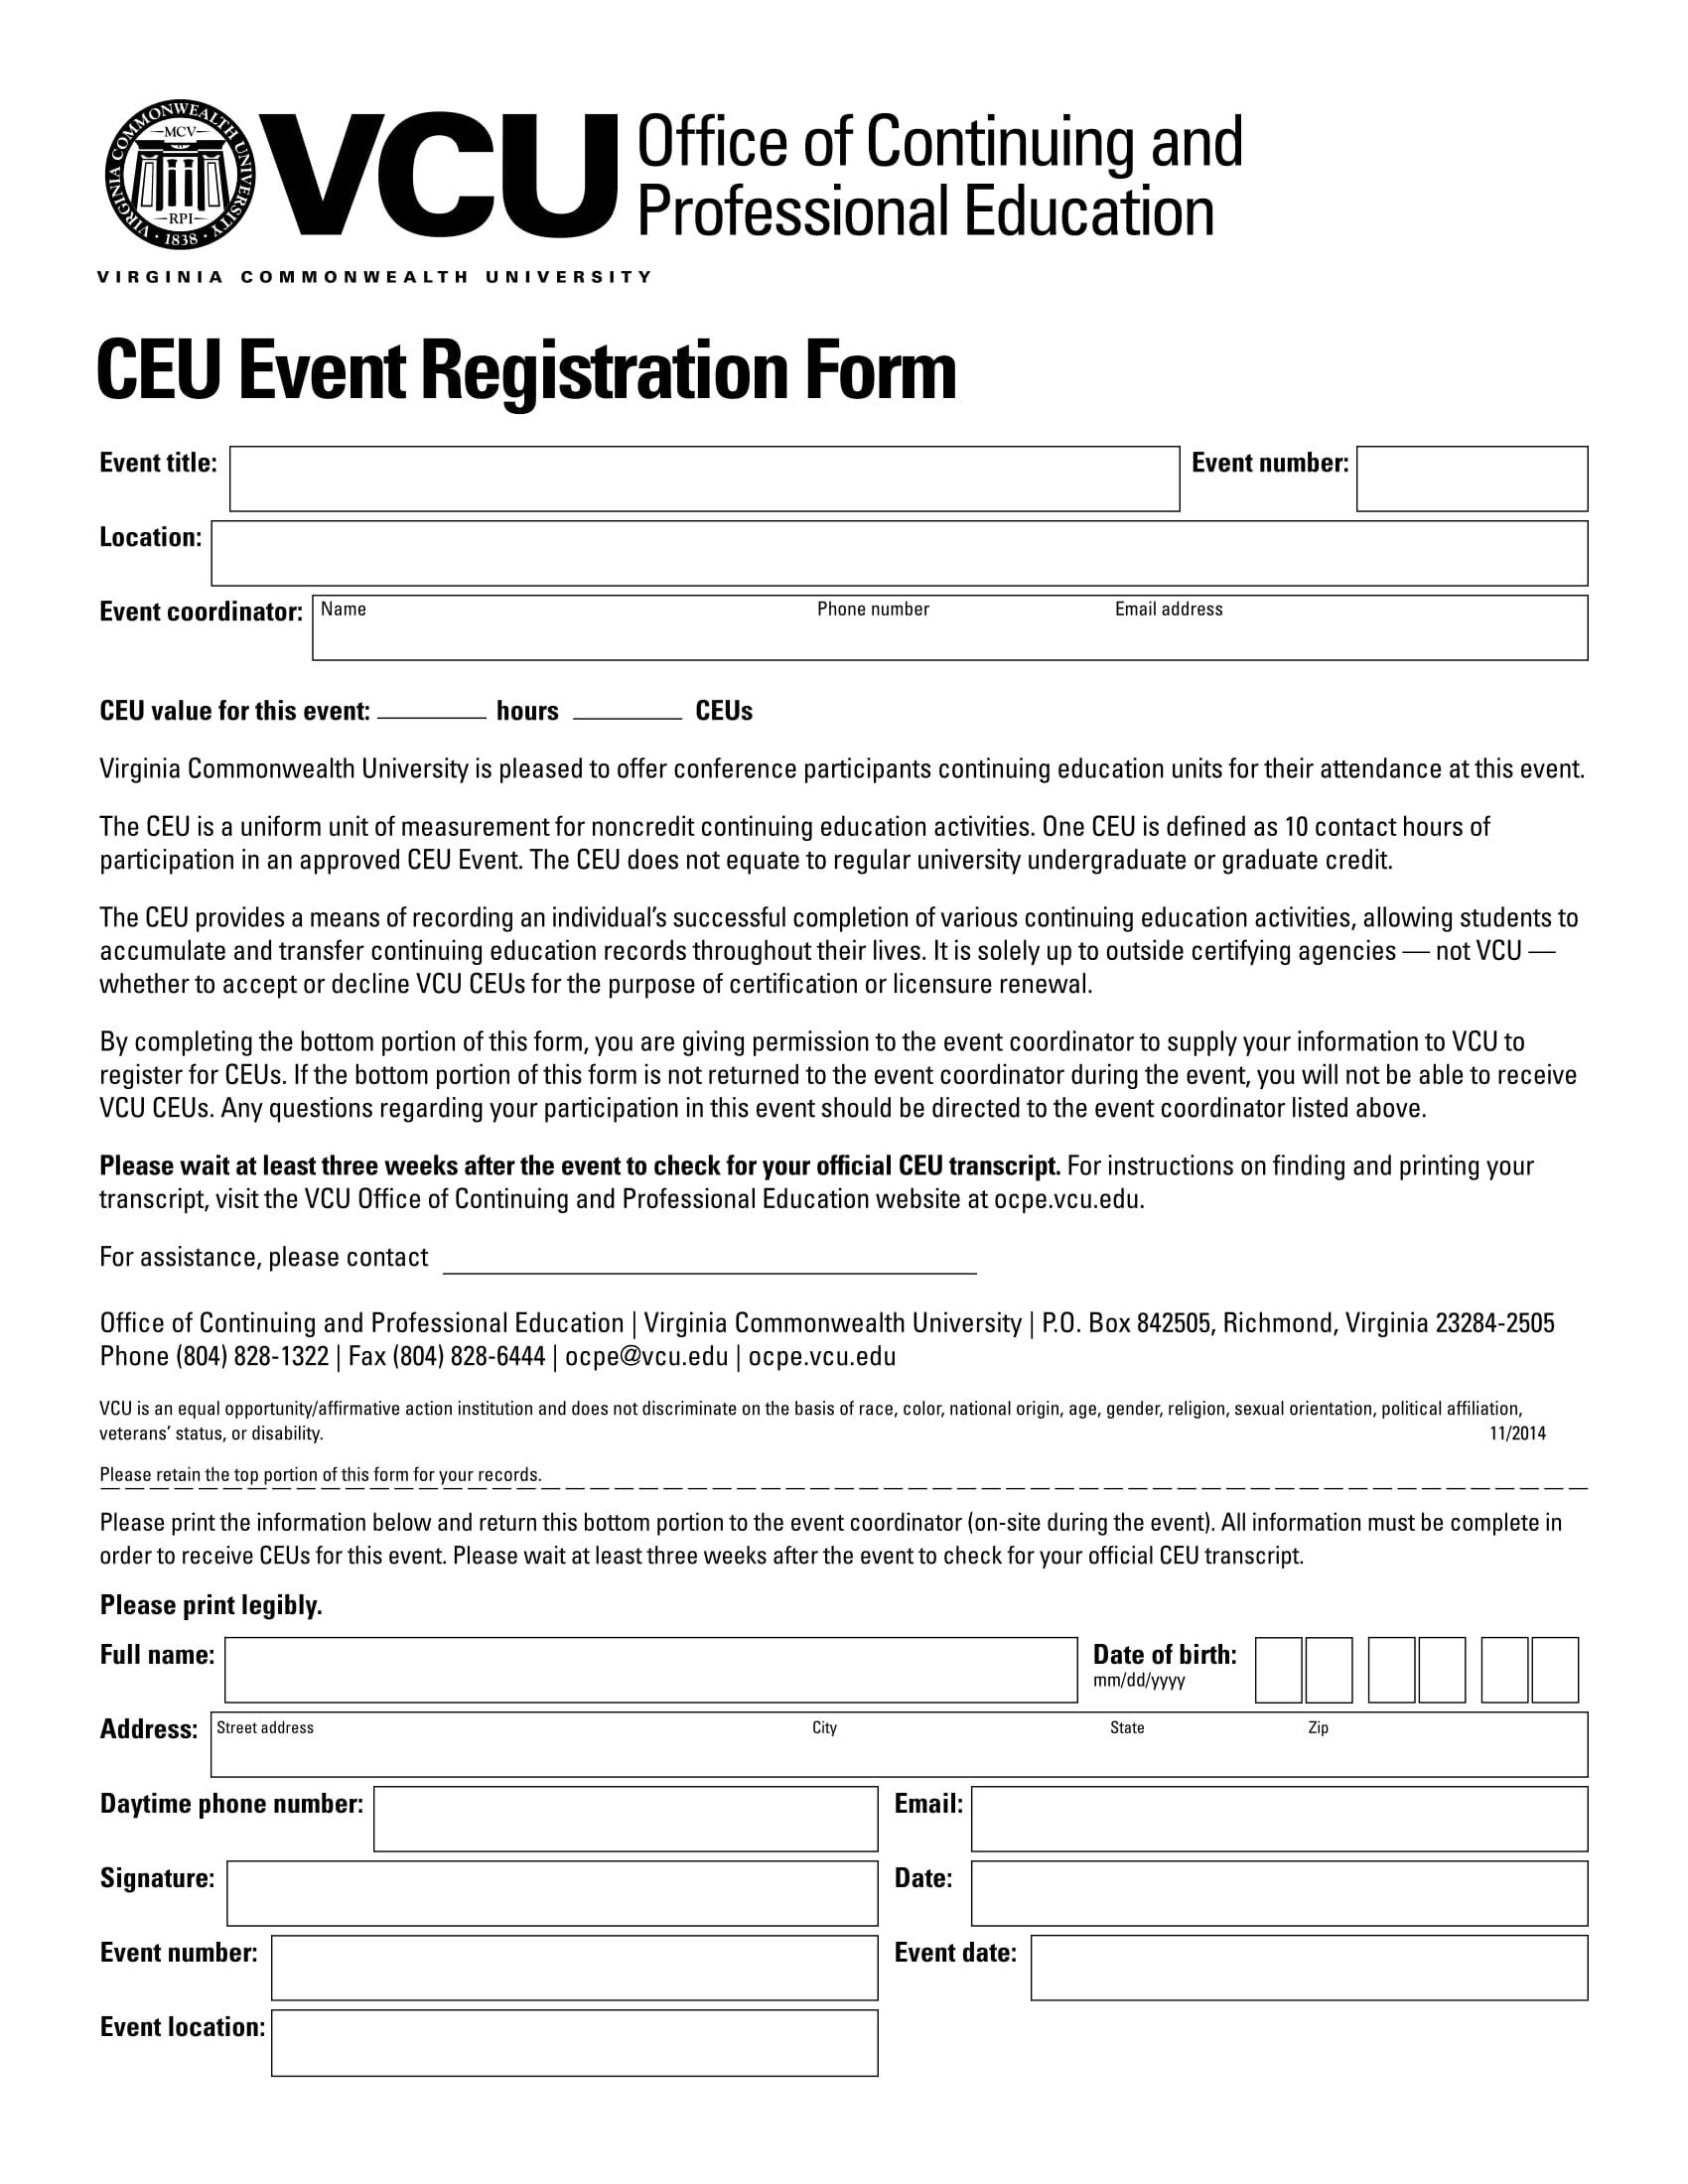 university event registration form 1